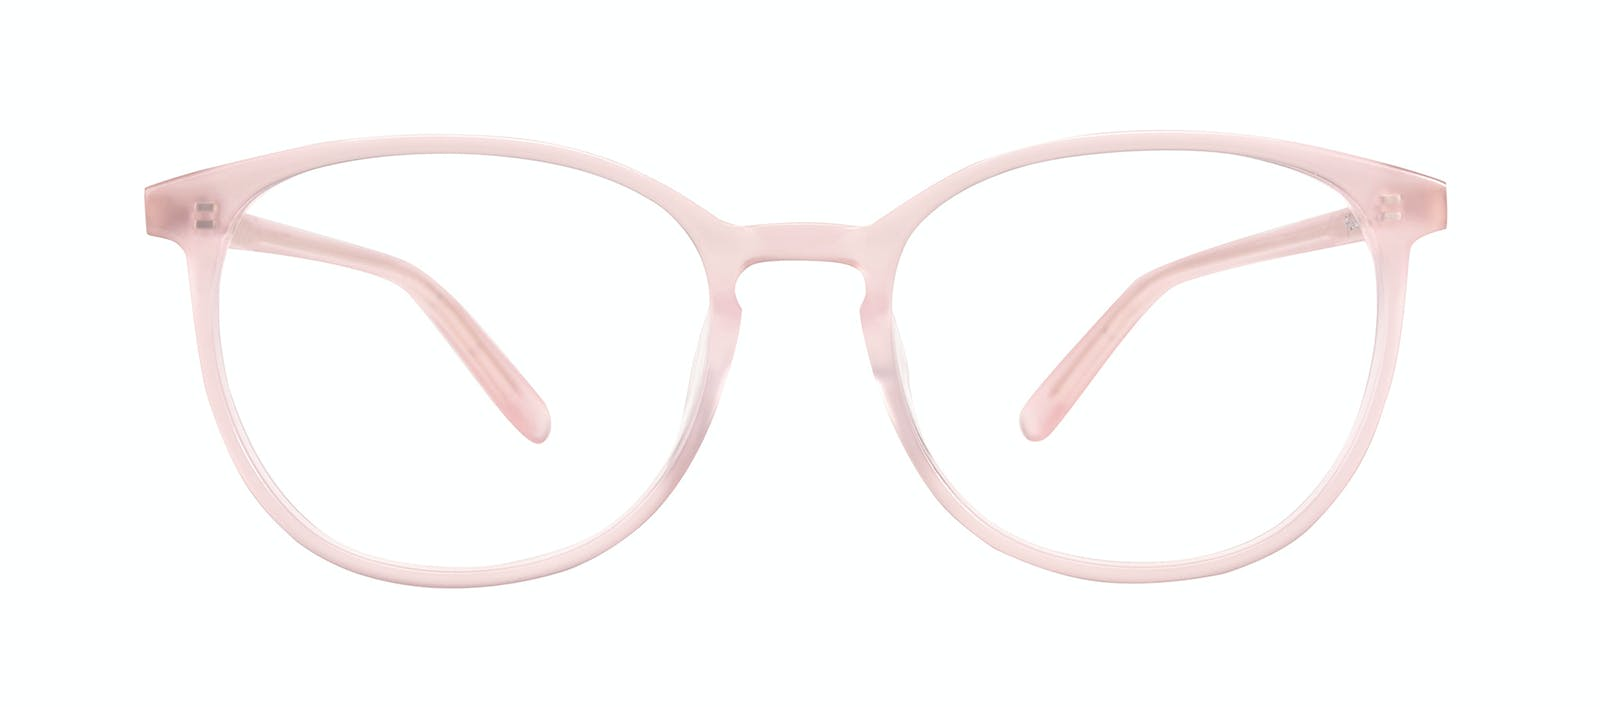 1ec7363873a Affordable Fashion Glasses Round Eyeglasses Women Femme Libre Mila Front